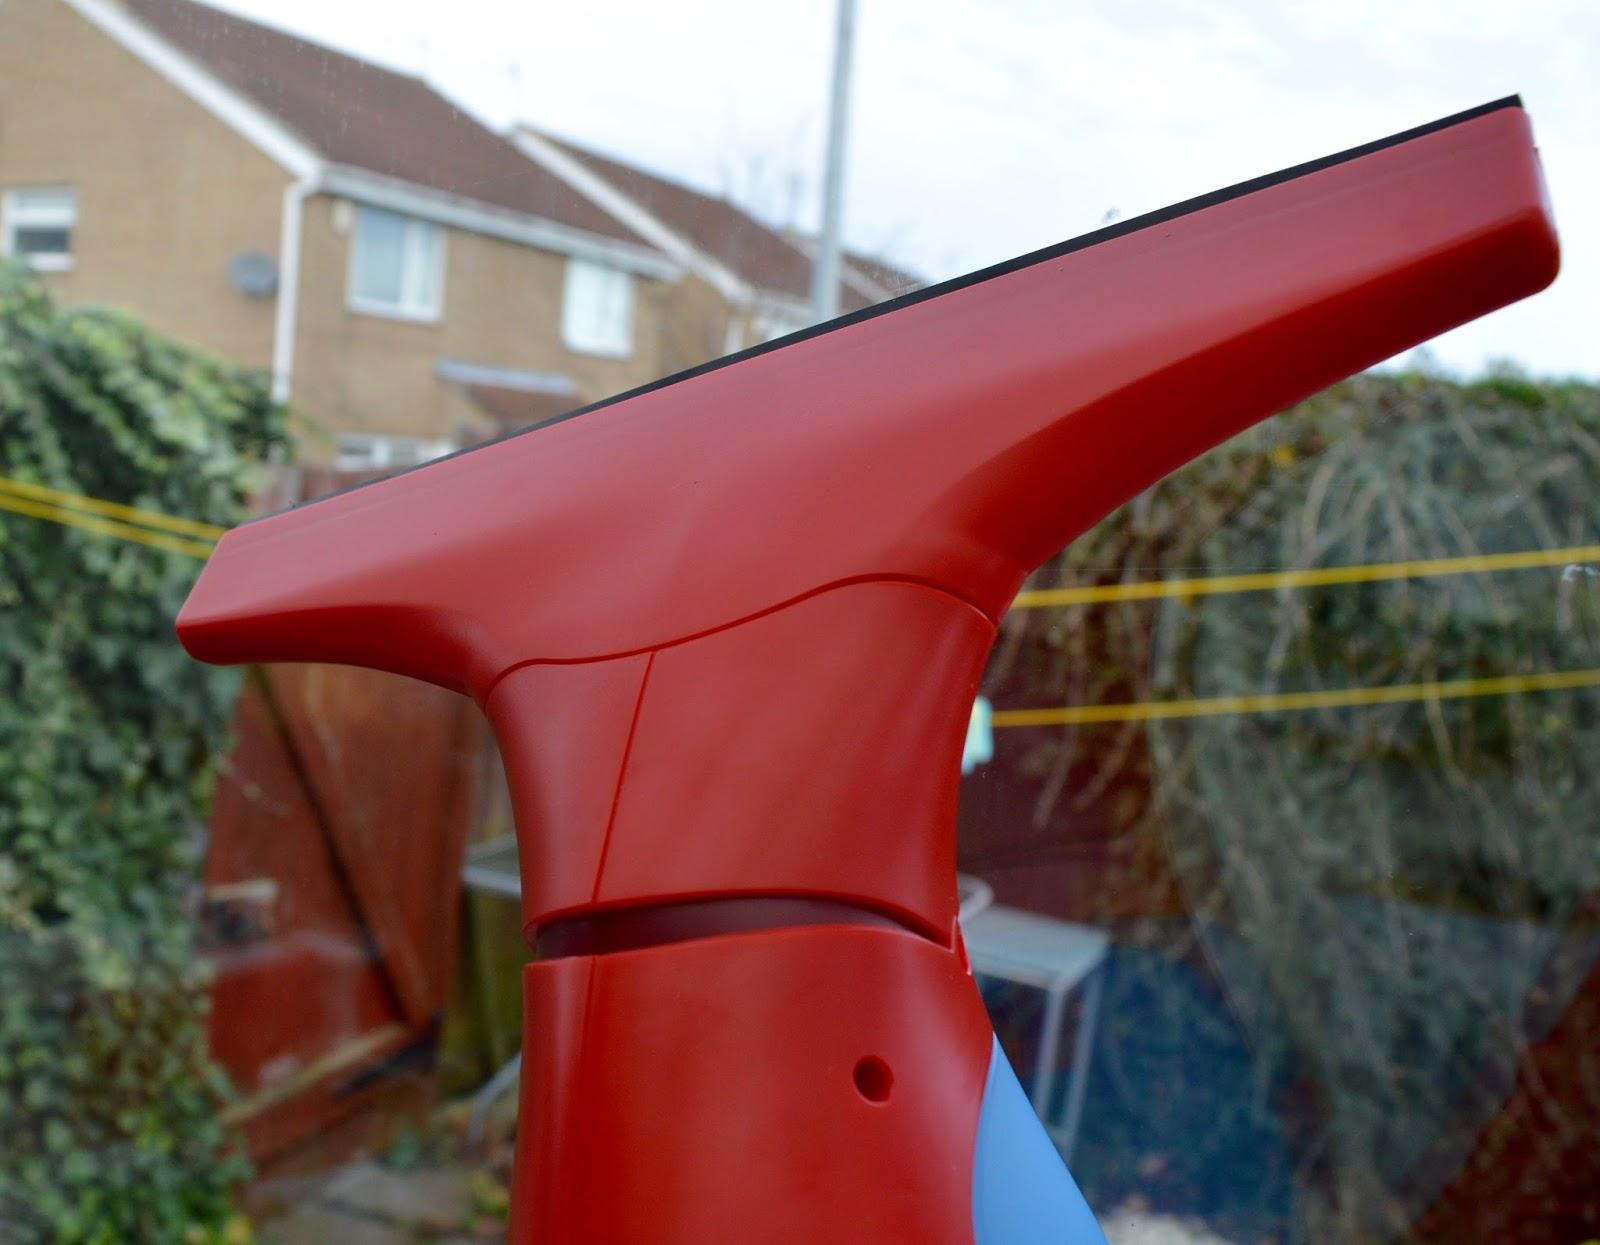 Vileda Windomatic Window Vacuum Review | How to achieve streak free windows - streak free finish